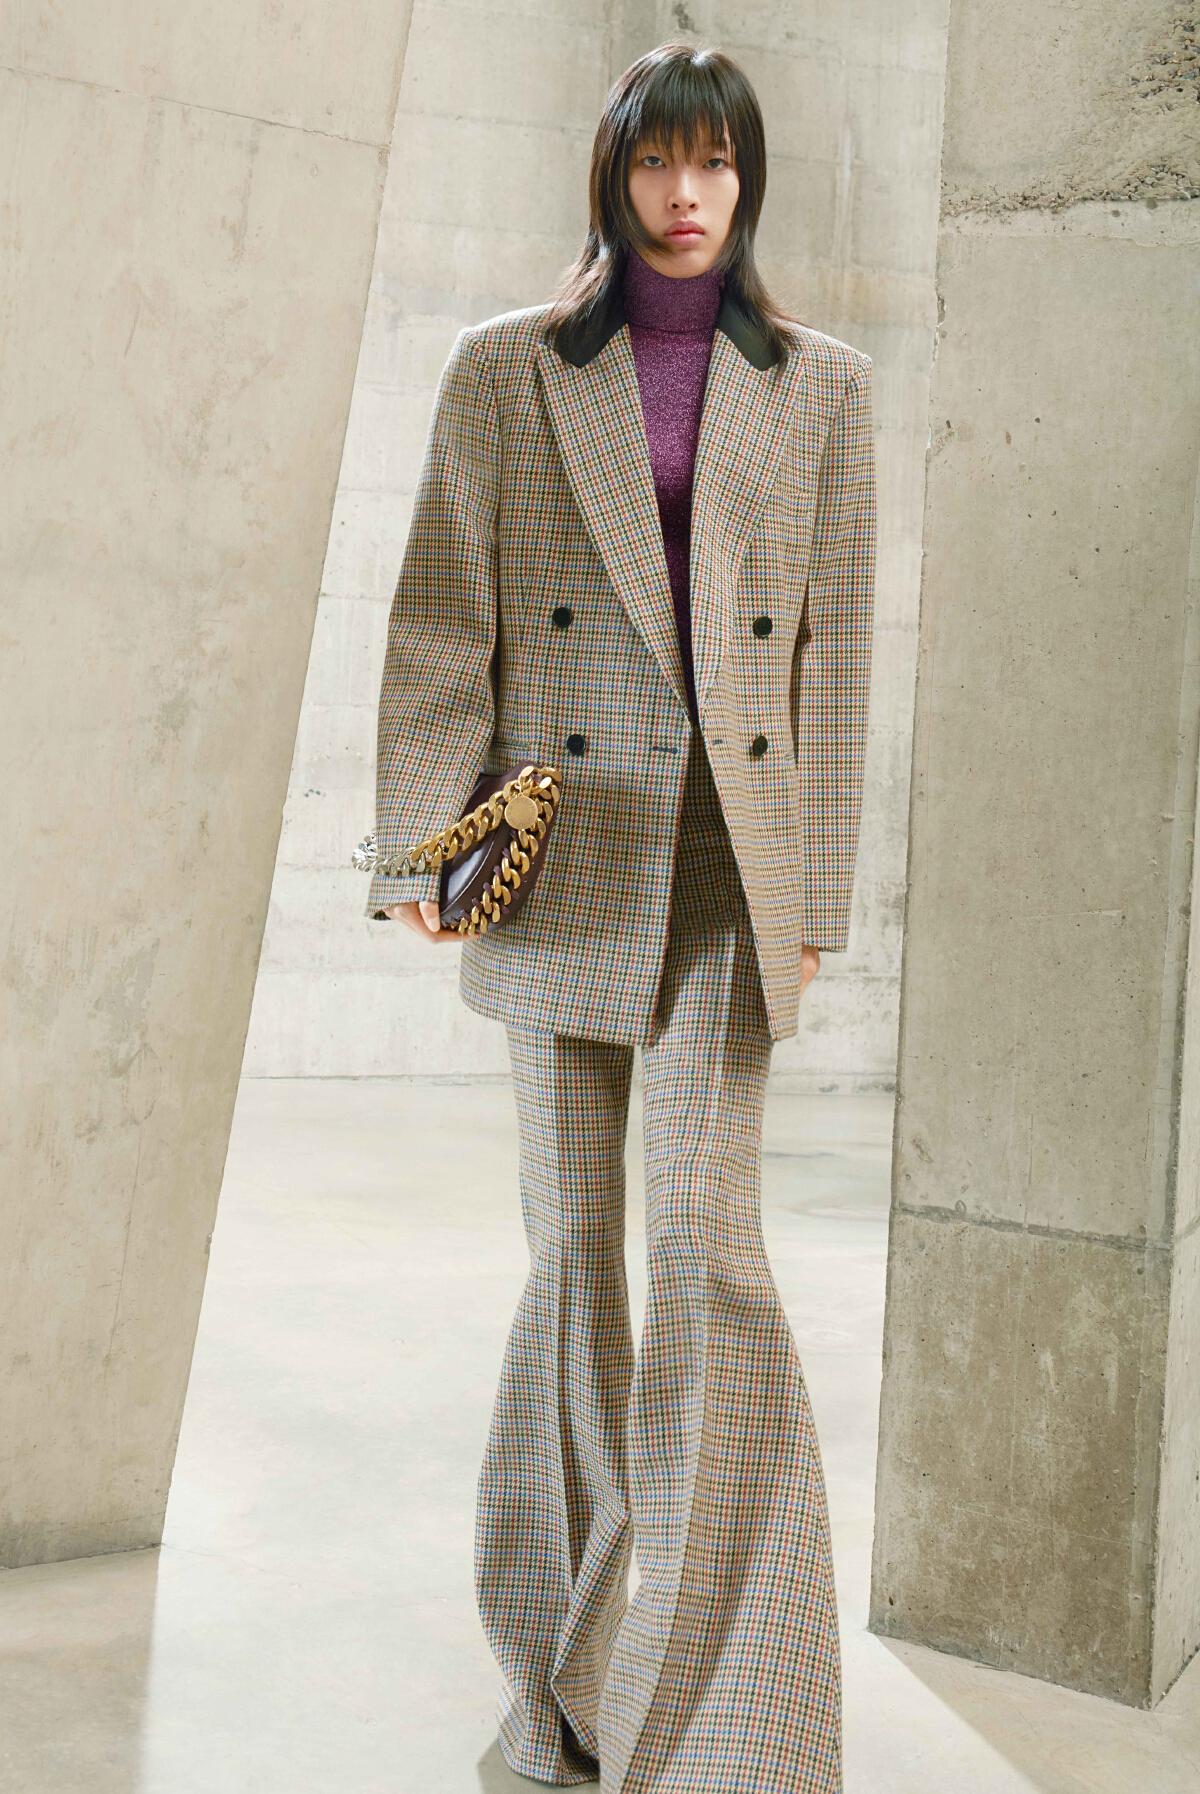 Stella McCartney คอลเลคชั่นกระเป๋าหนังวีแกน...และสายโซ่รีไซเคิล